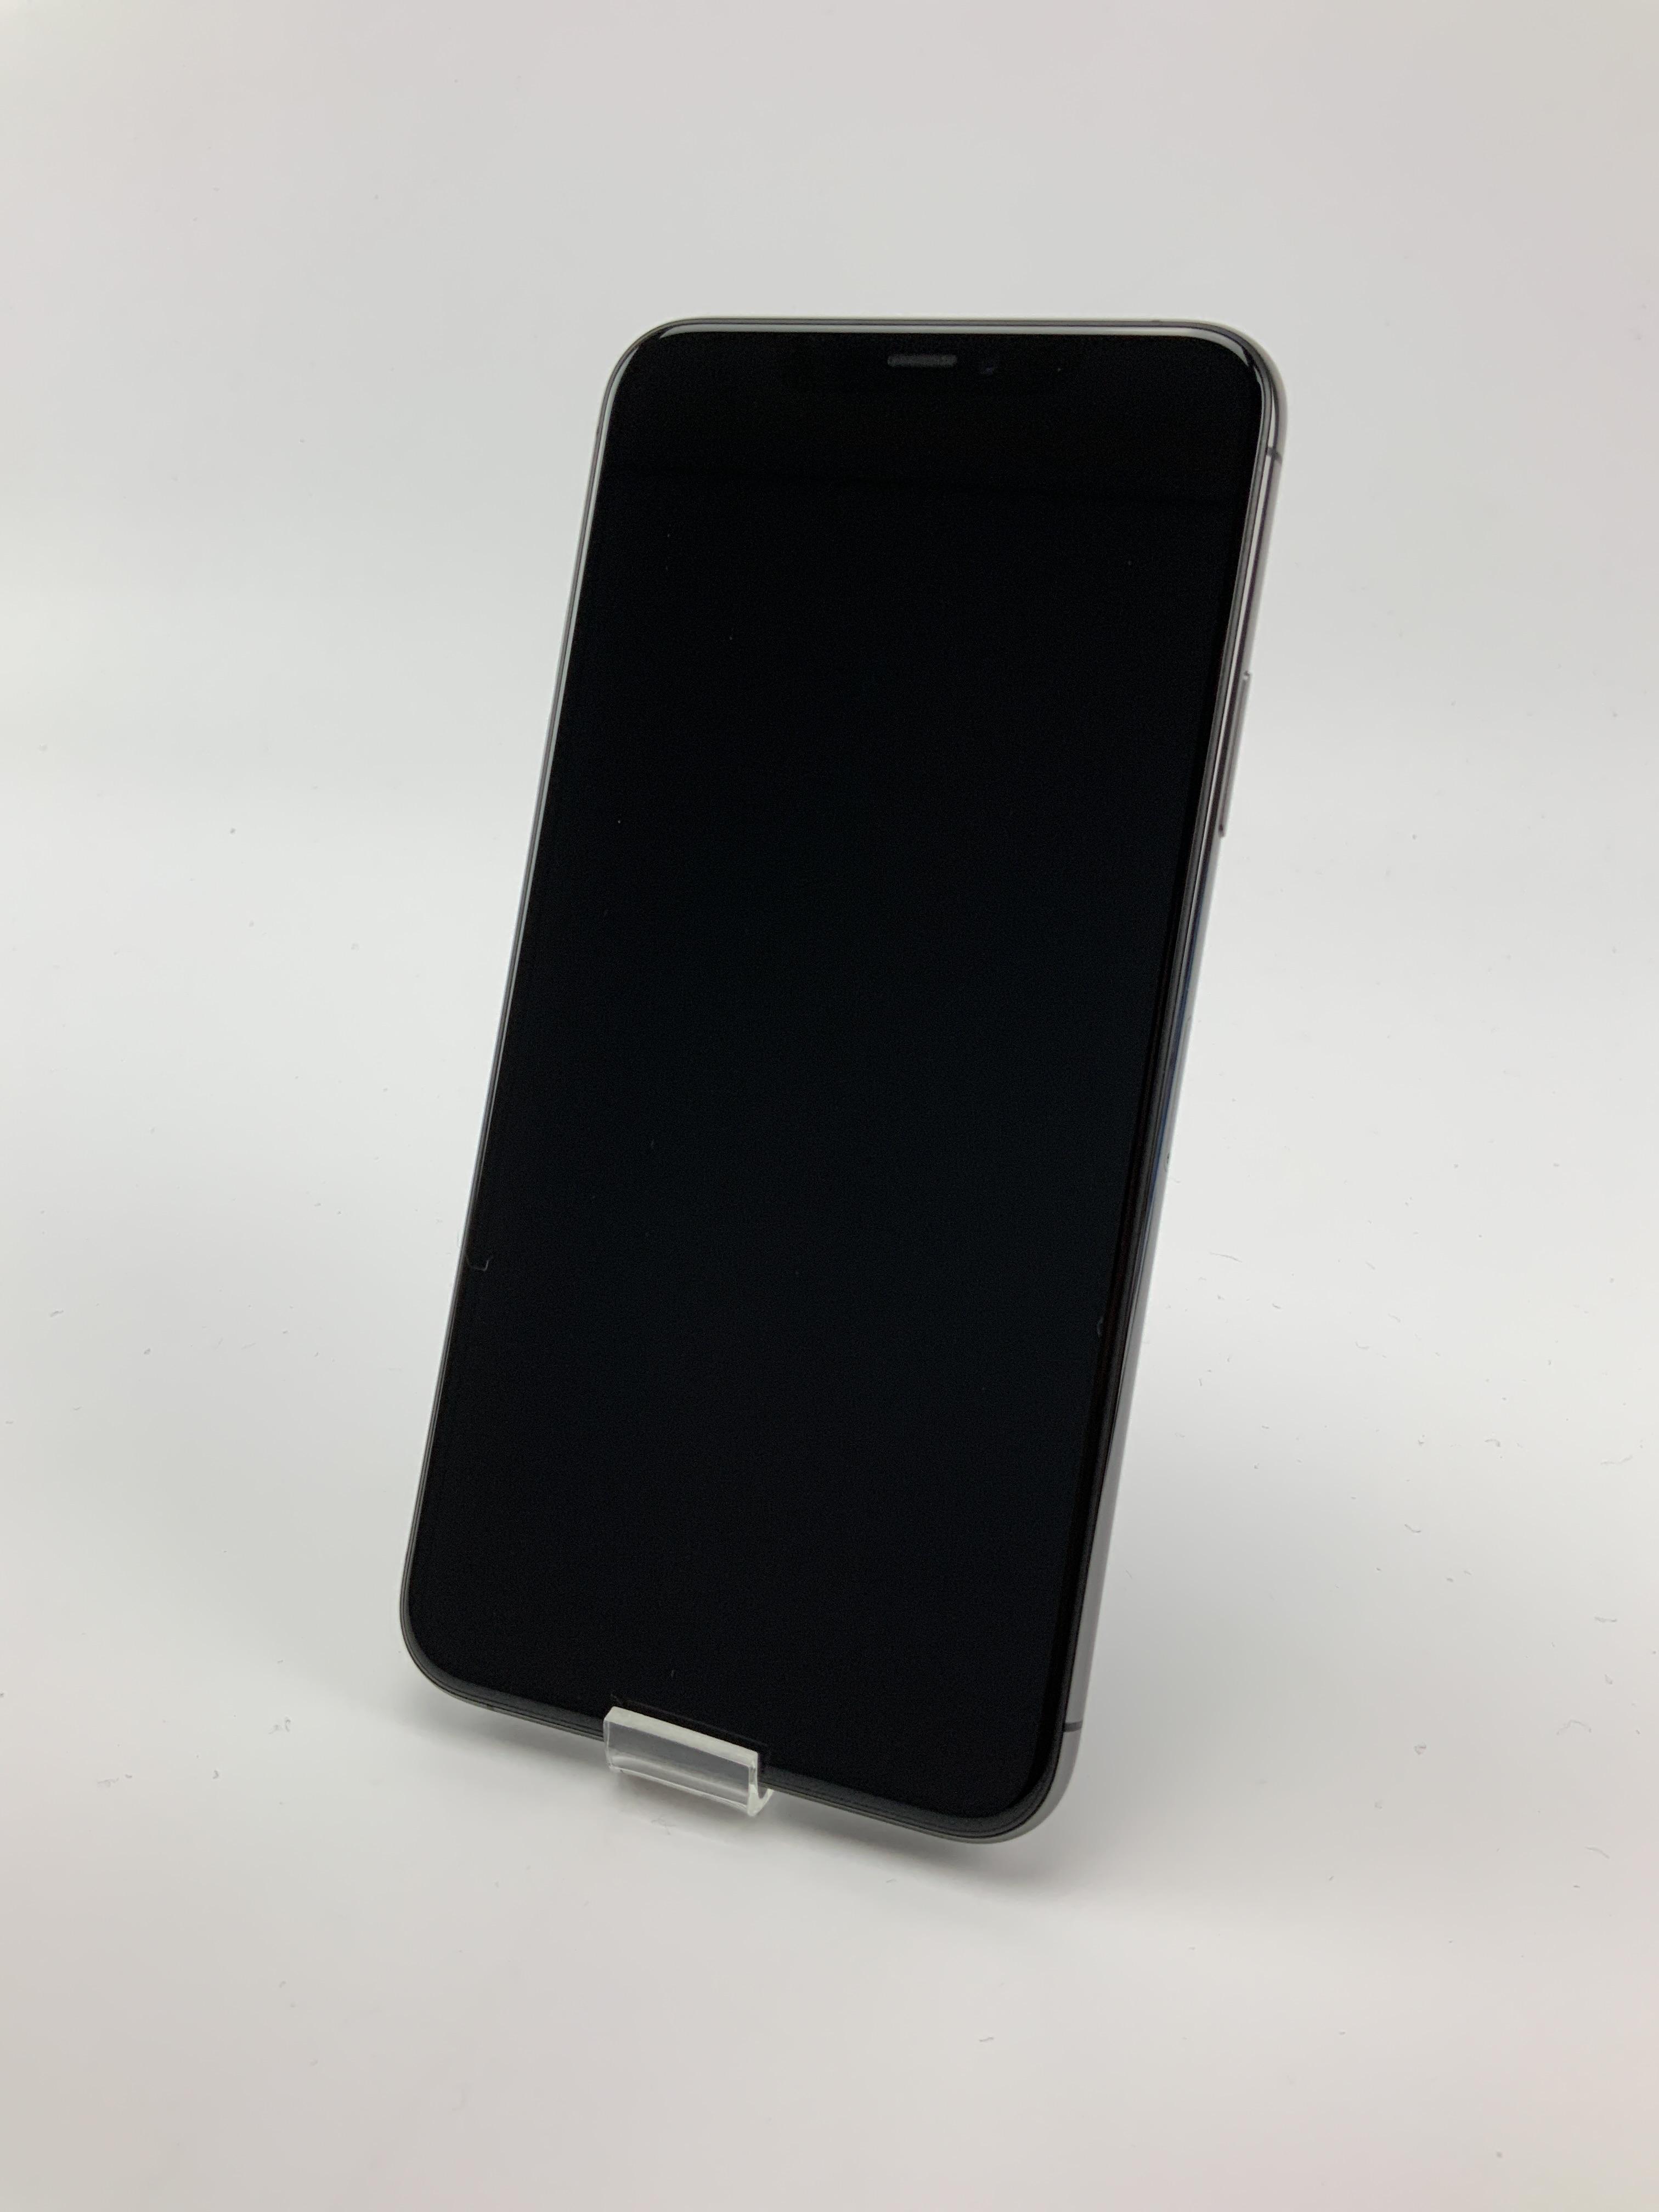 iPhone 11 Pro Max 256GB, 256GB, Space Gray, Kuva 1